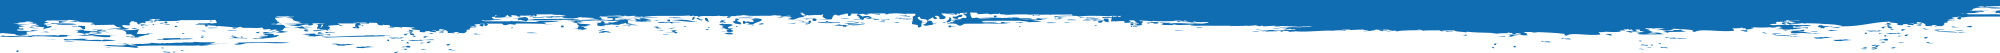 Blue Banner4